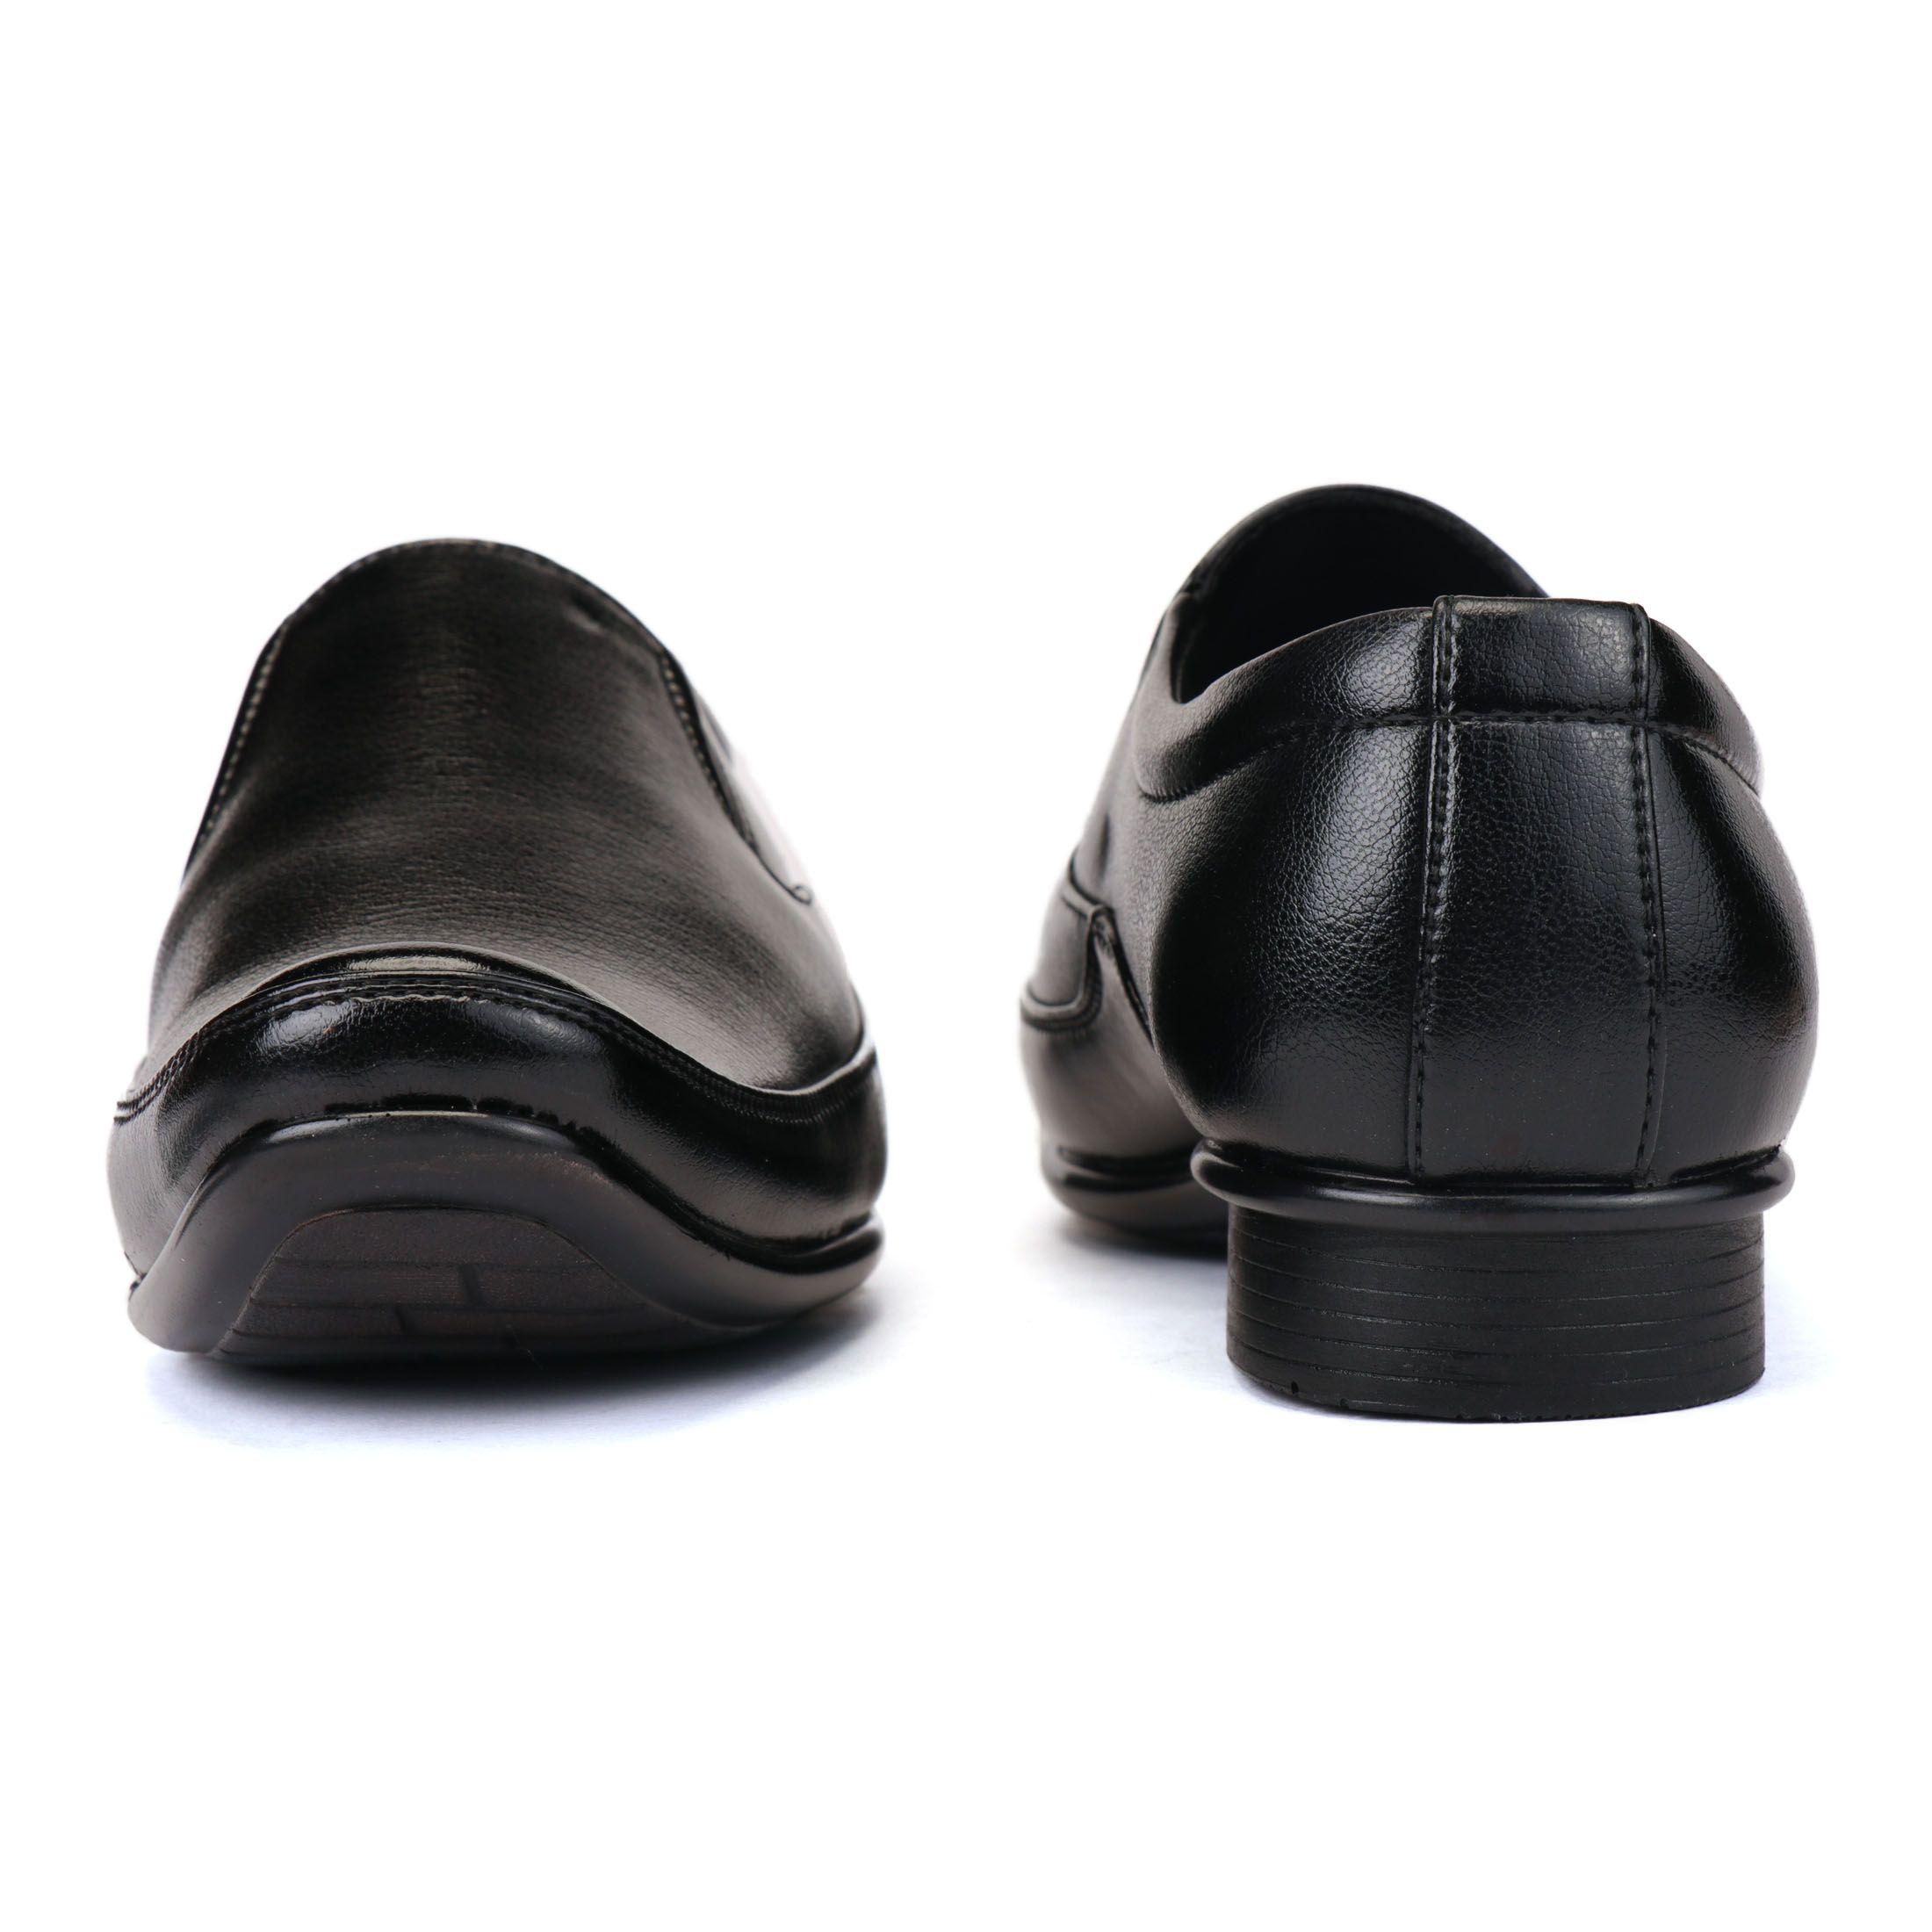 Vantinoo Men's Formal Shoes online at